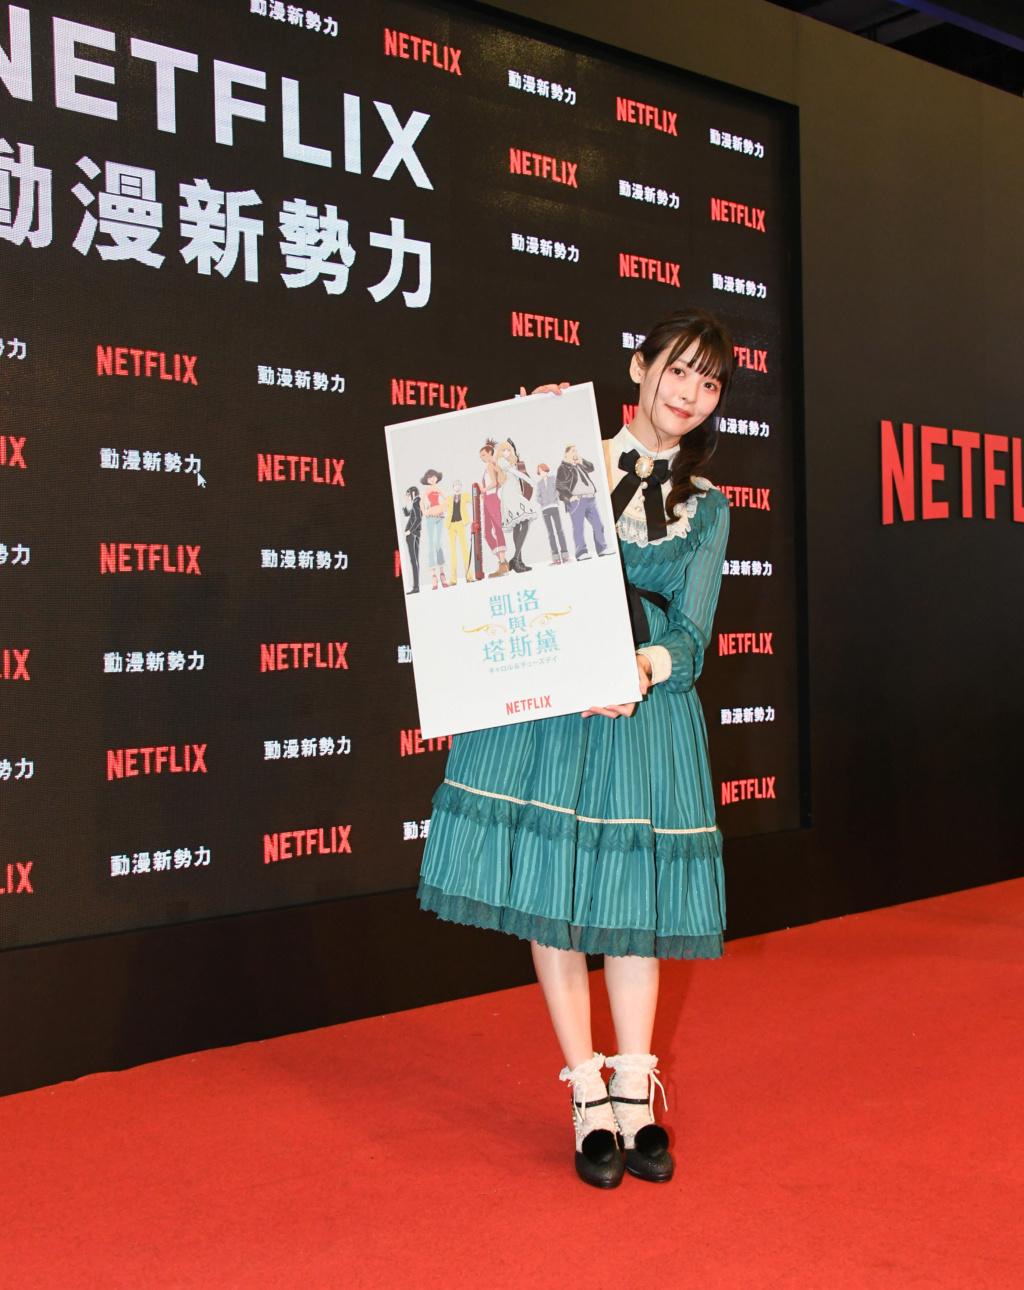 Netflix 台北漫畫博覽會初體驗大成功!星光陣容嗨翻全場粉絲引爆年度盛會最高潮 Taipei36